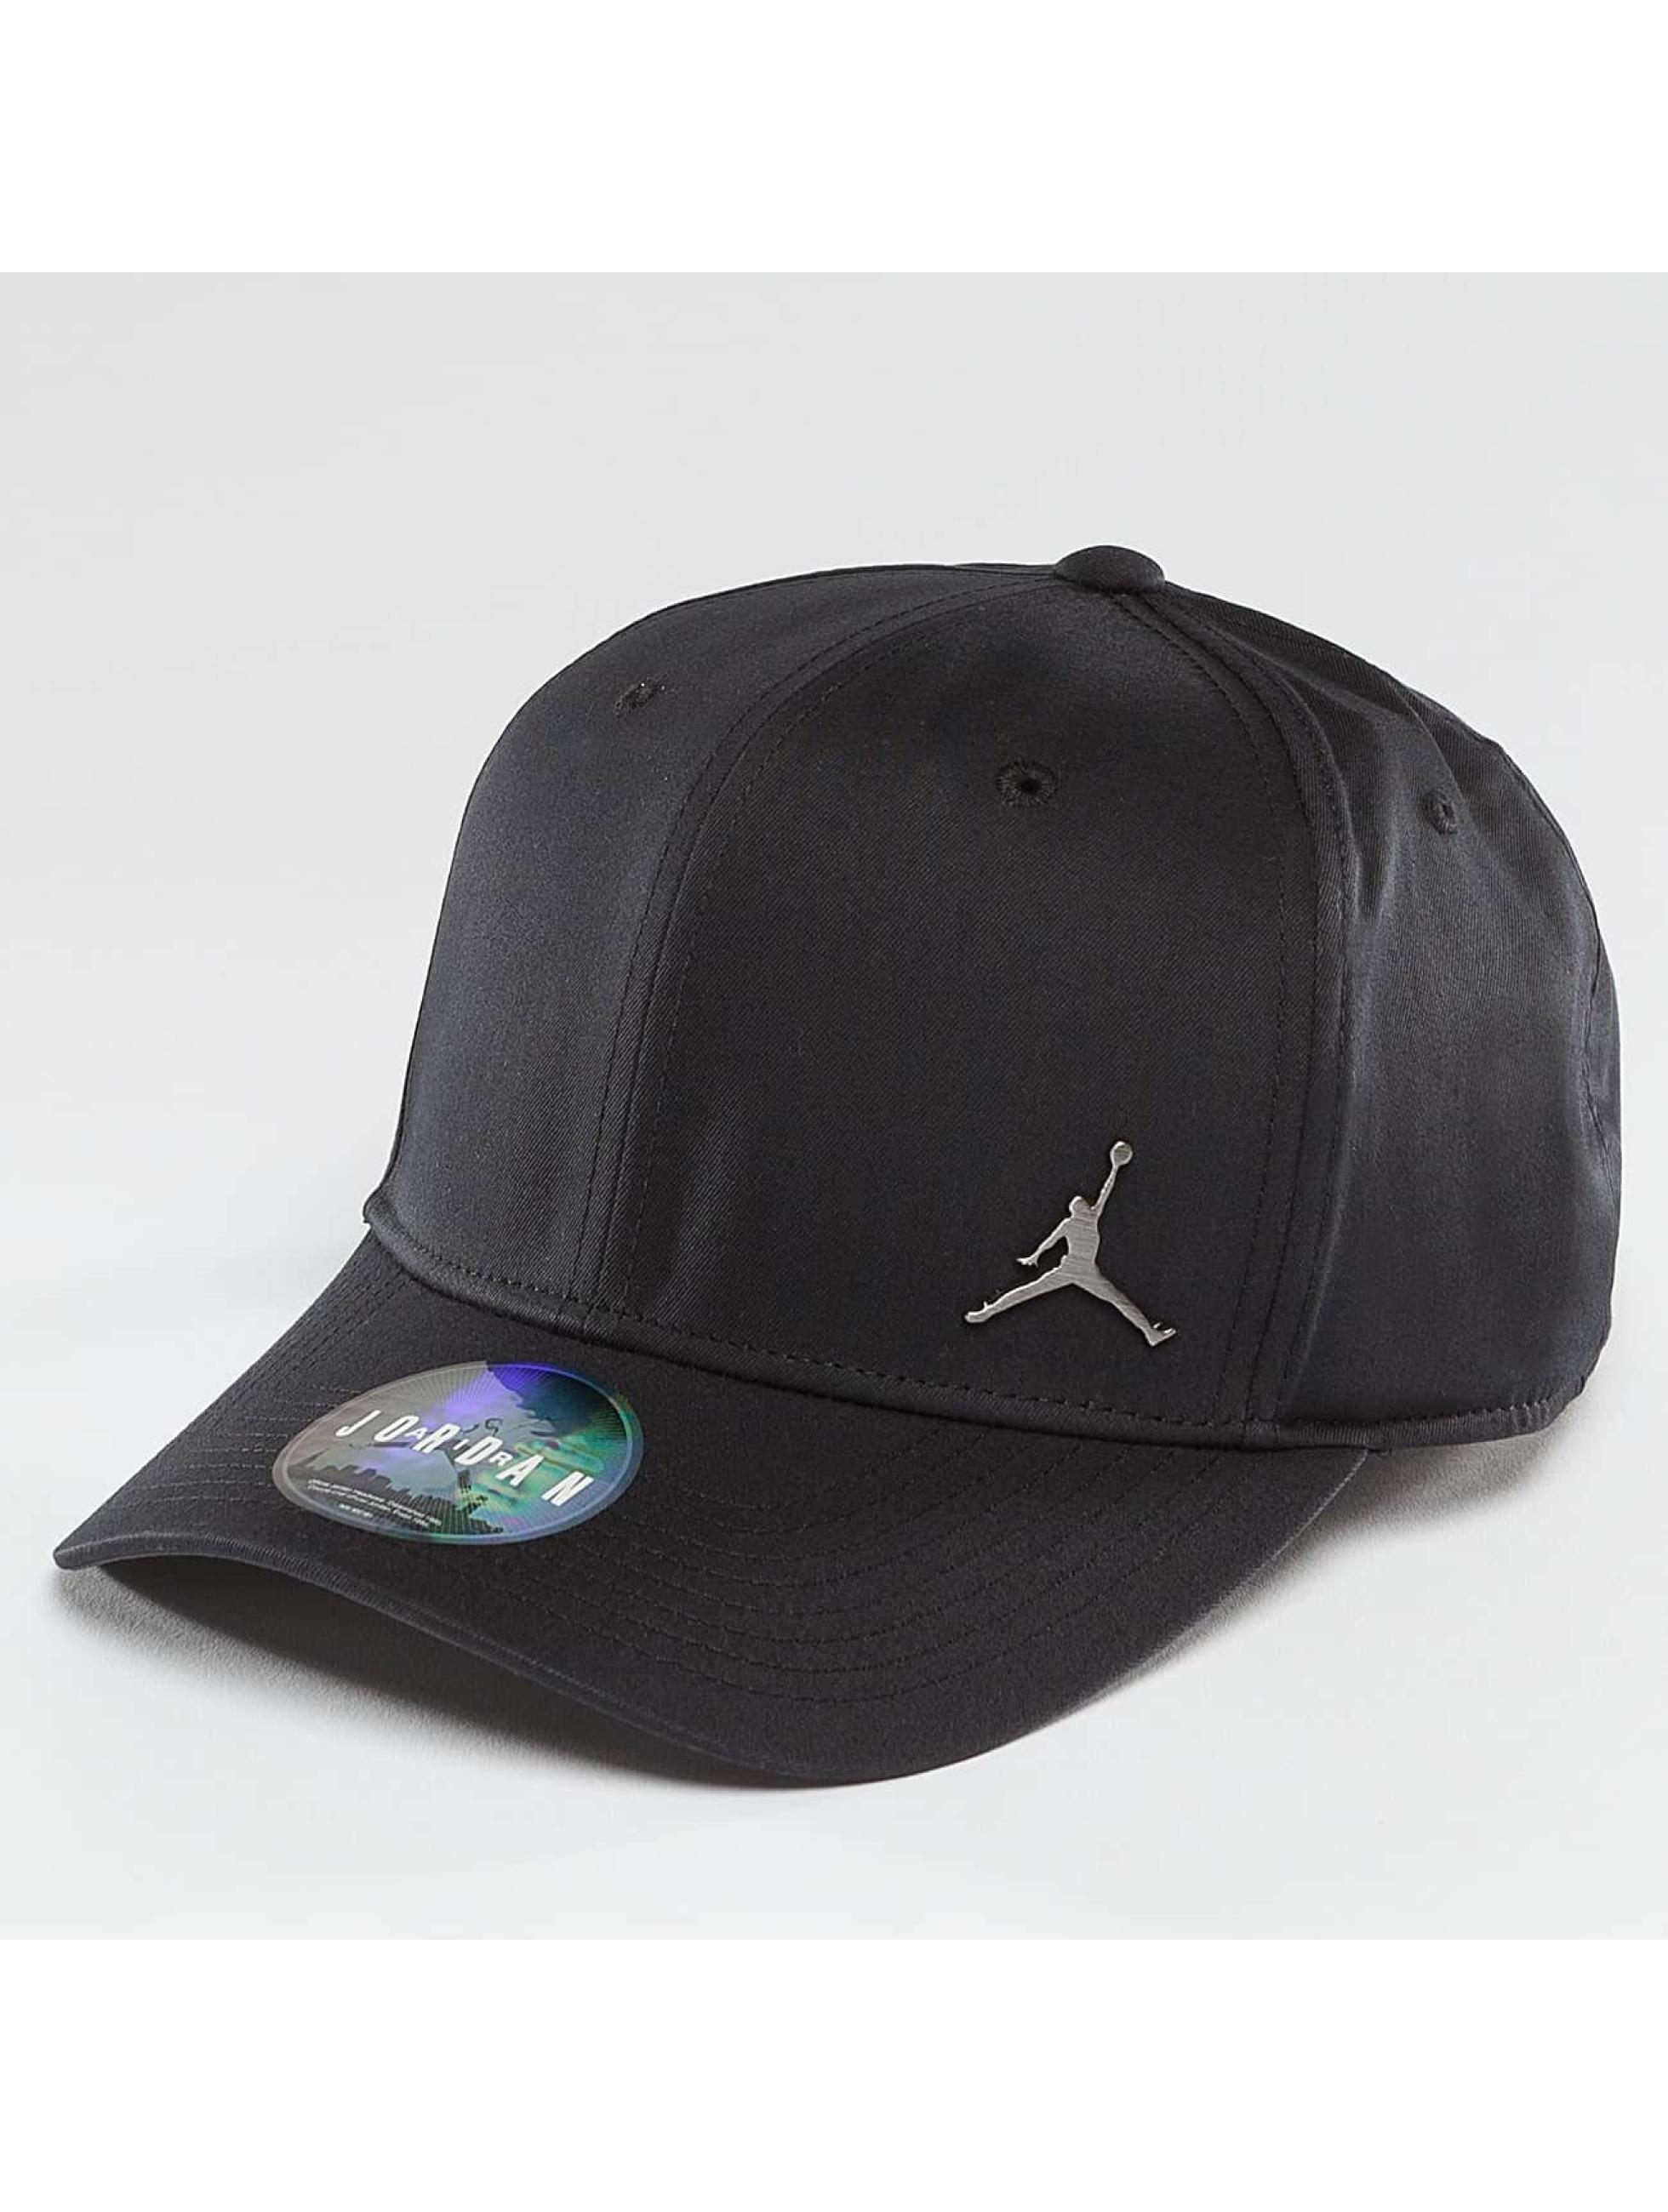 Jordan Männer,Frauen Snapback Cap CLC99 Metal Jumpman in schwarz